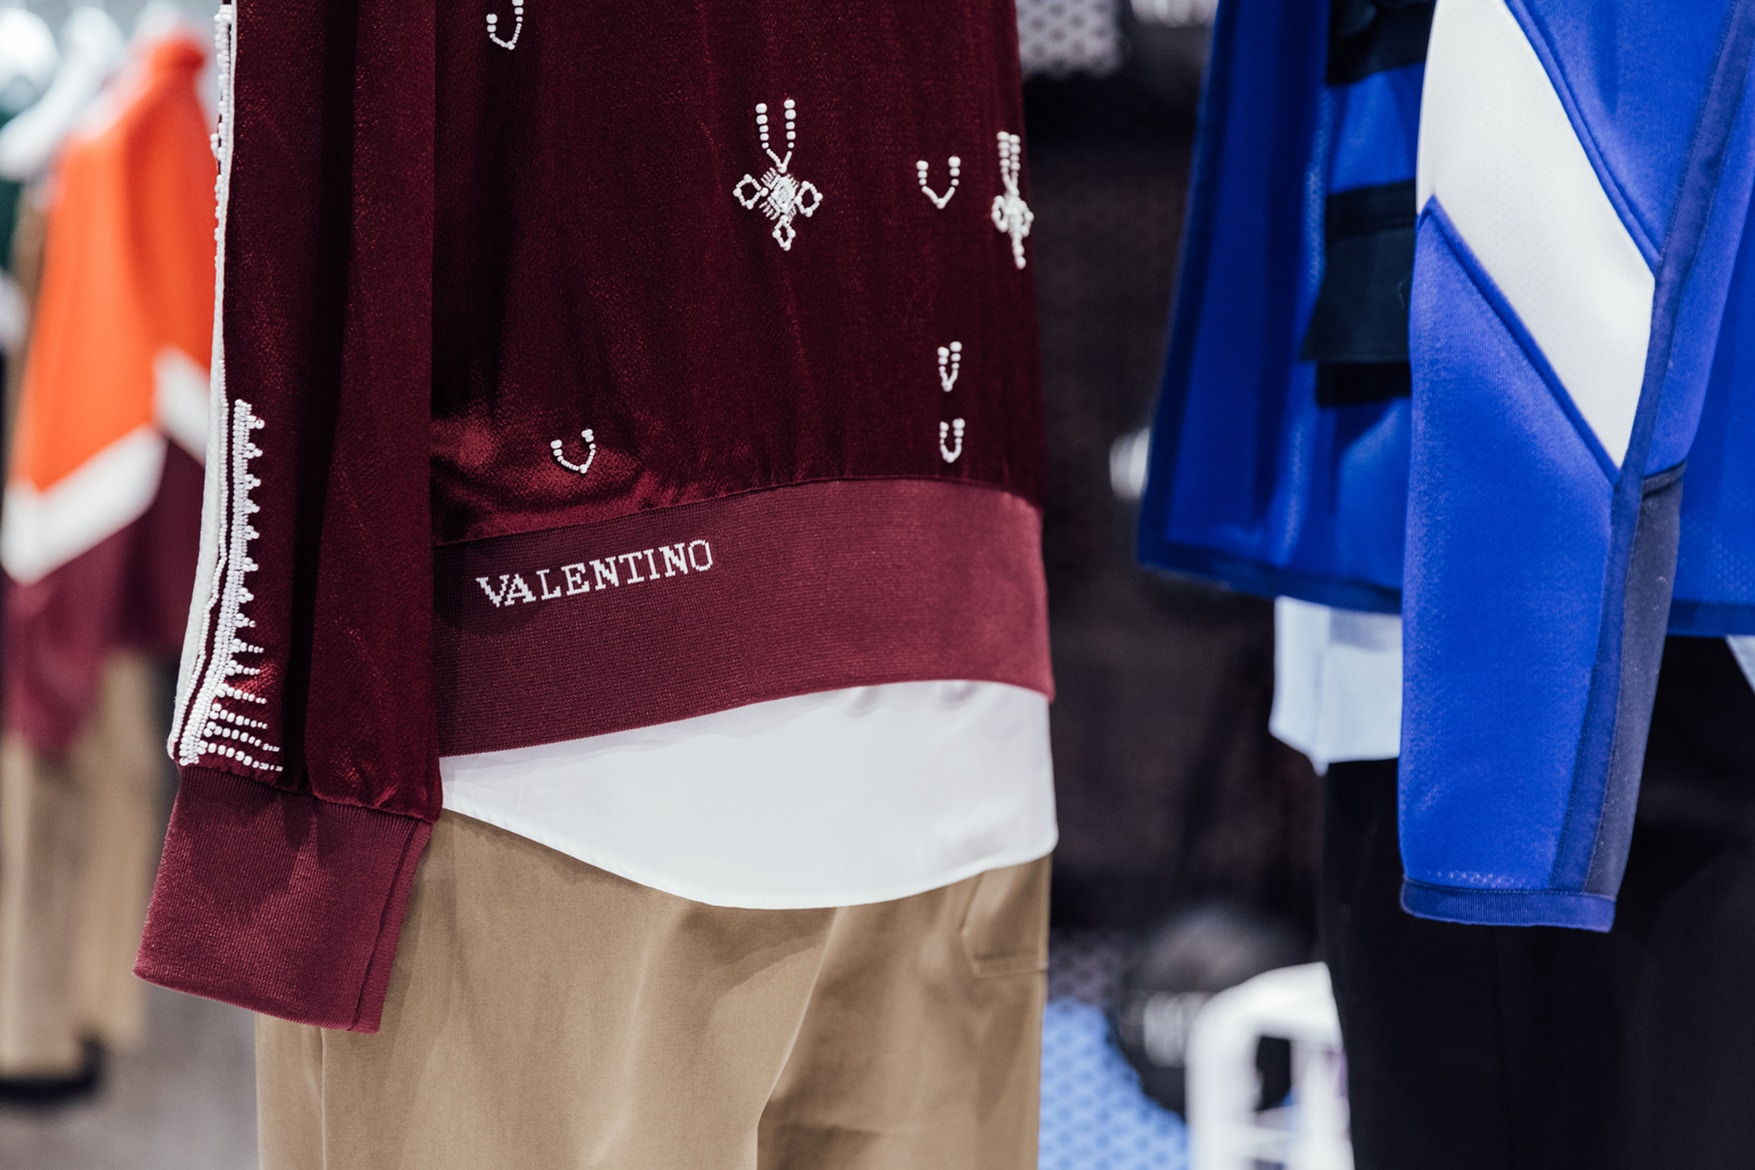 valentino-vltn-new-york-pop-up-mens-collection-30.jpg